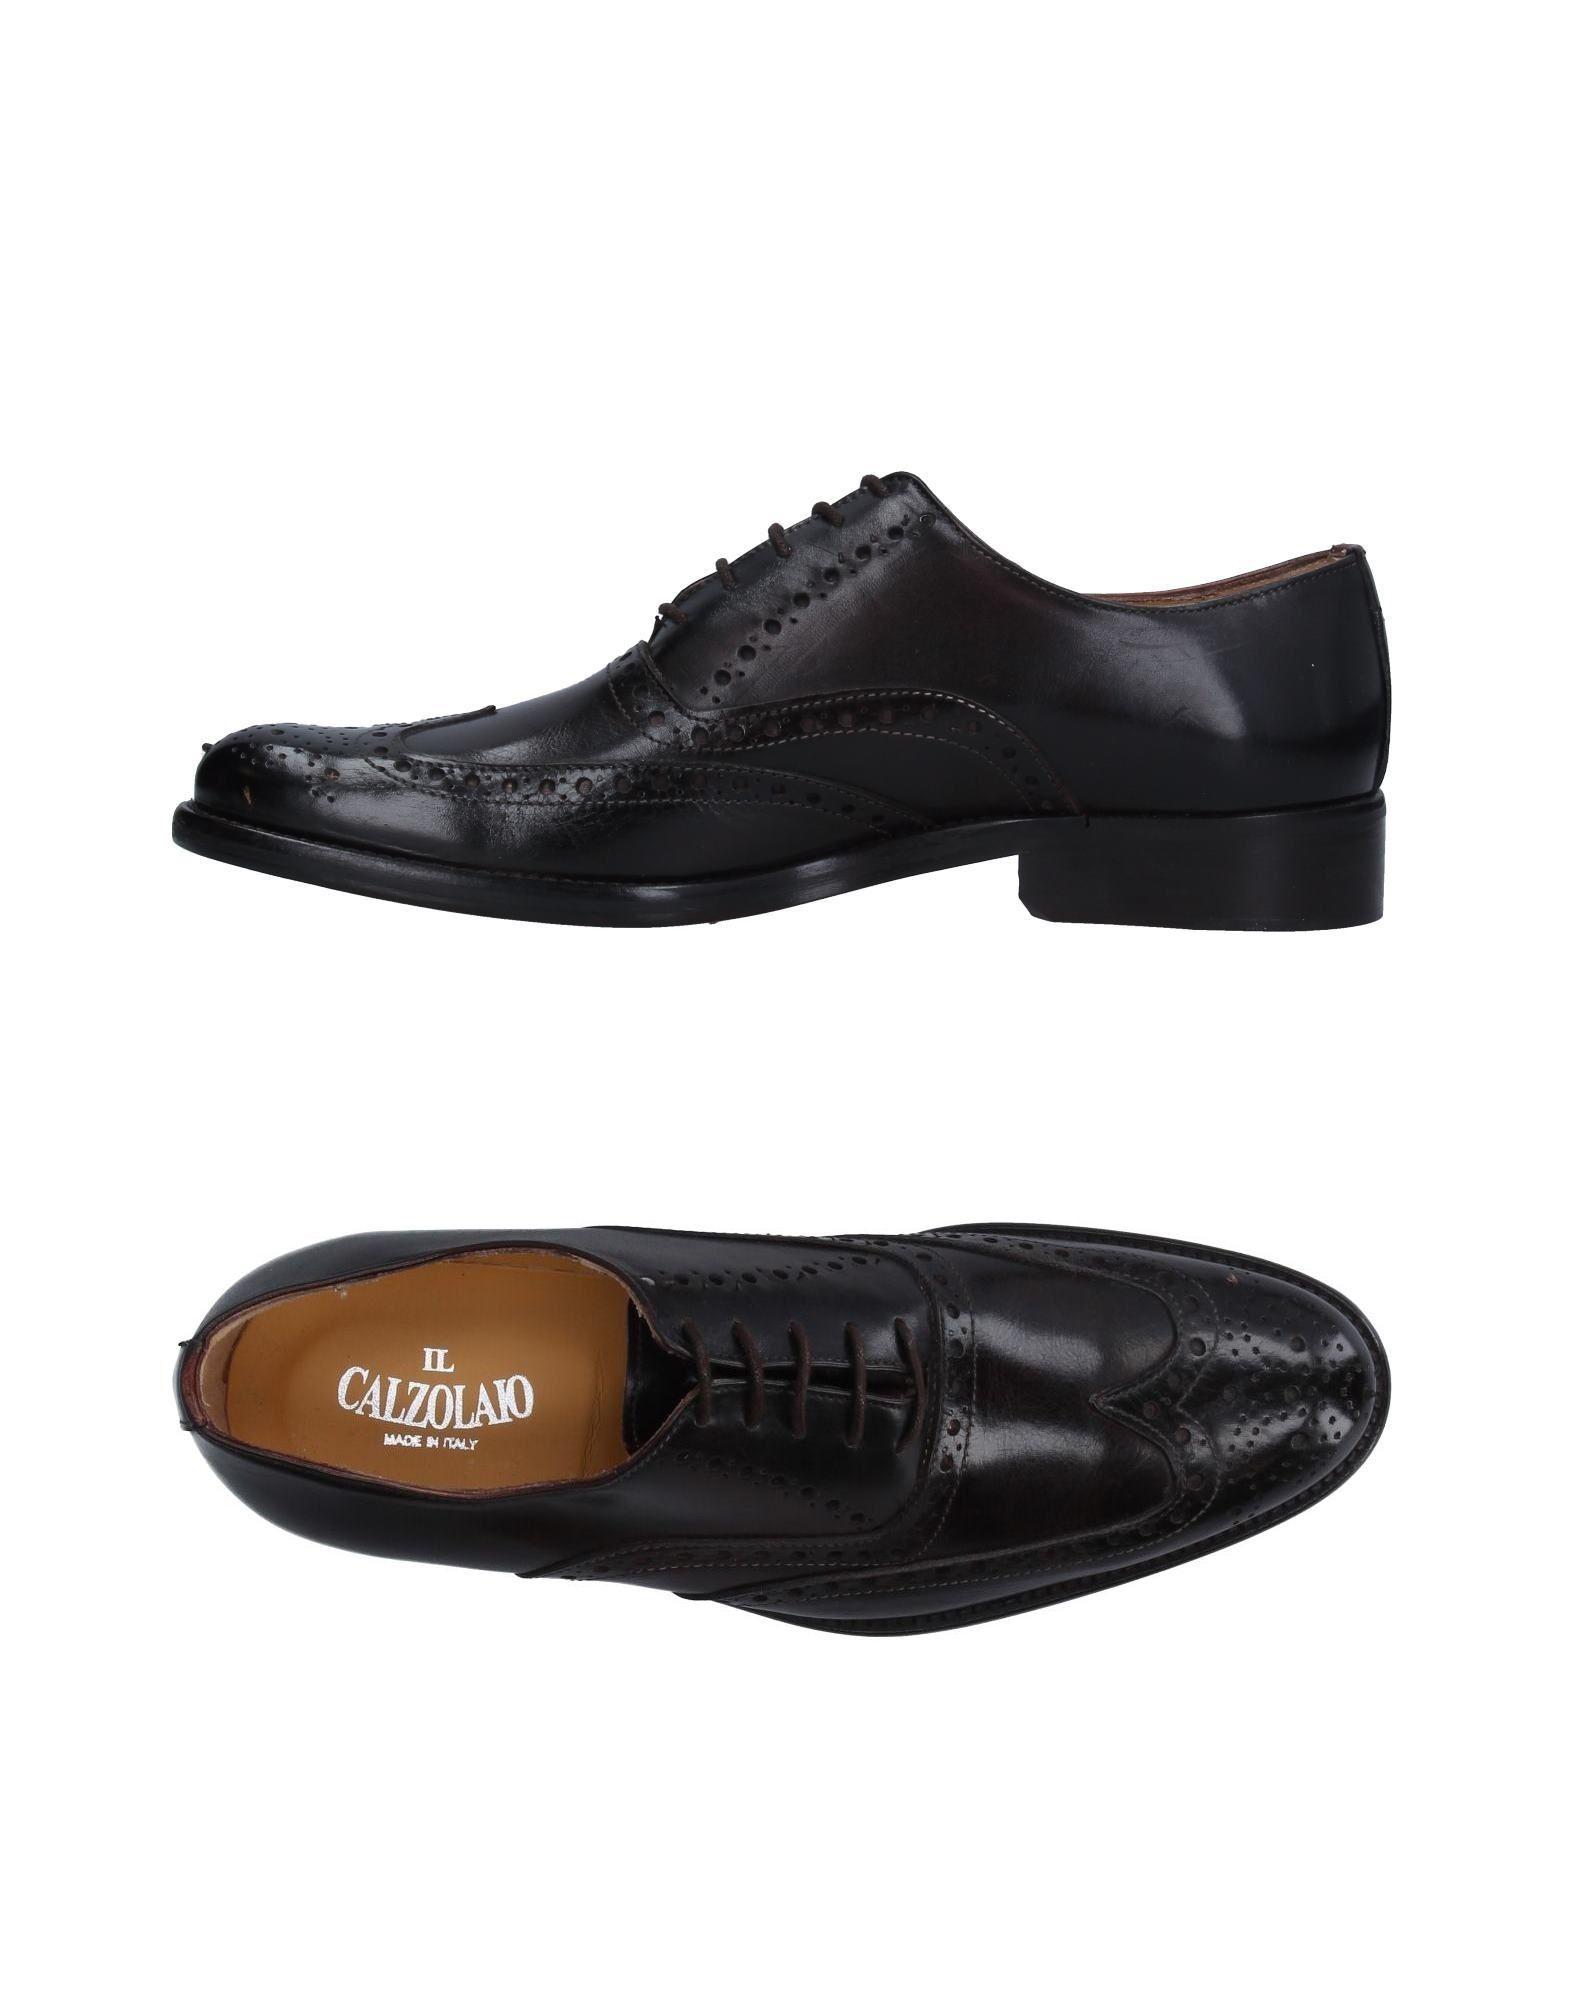 Фото IL CALZOLAIO Обувь на шнурках. Купить с доставкой